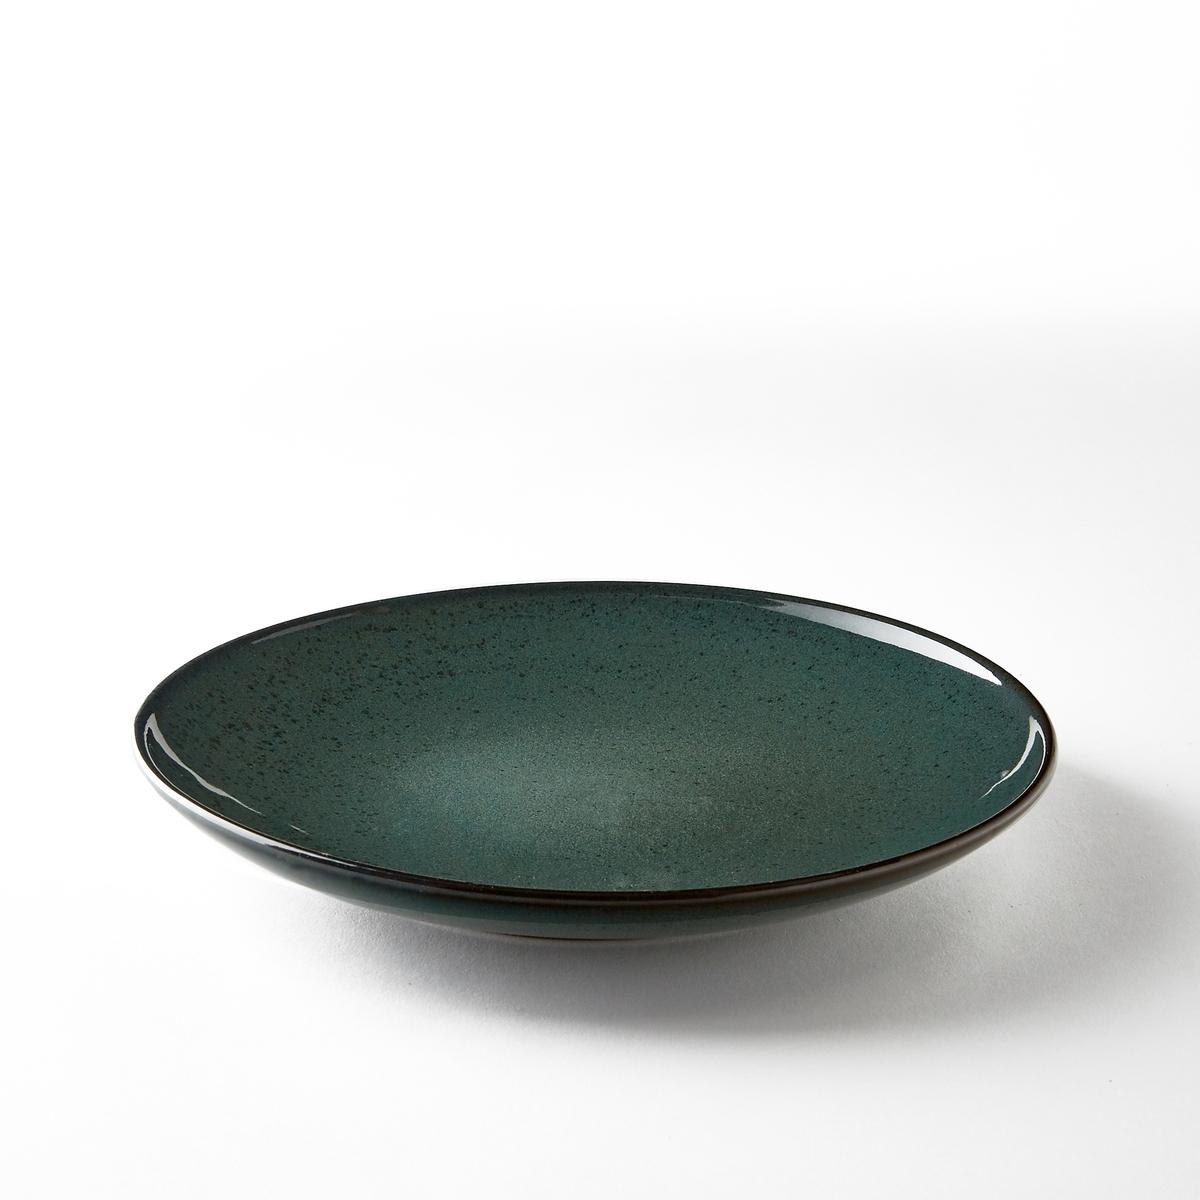 Тарелка мелкая из керамики, диаметр 28,5 см, Aqua от Serax